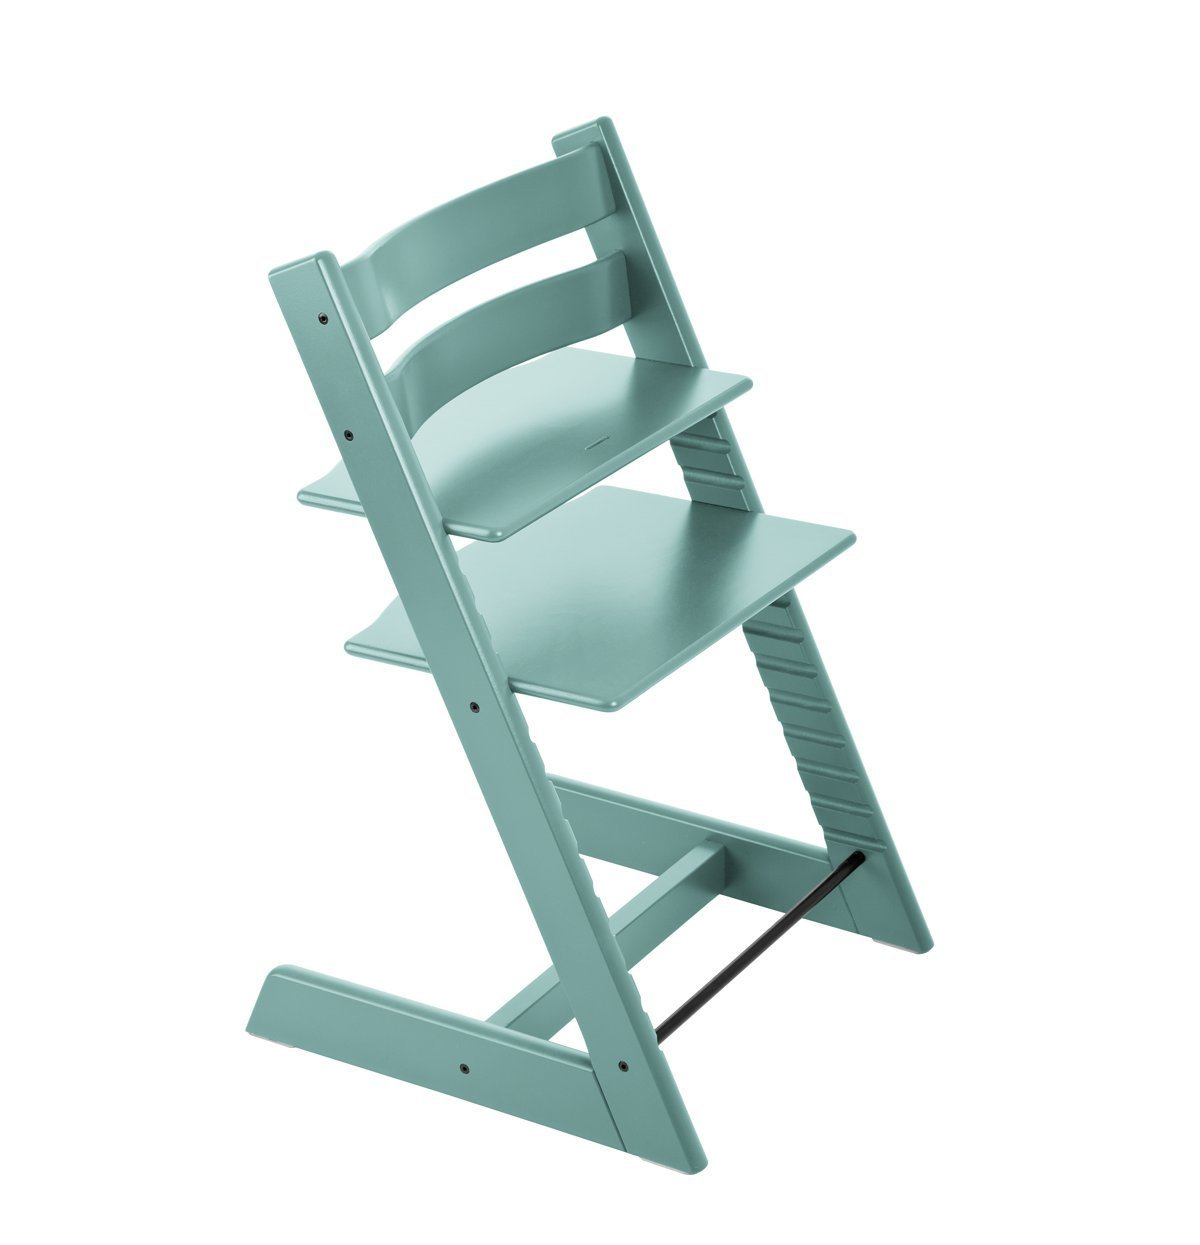 stokke tripp trapp, stokke high chair, best high chair, best high chair for baby, wooden high chair